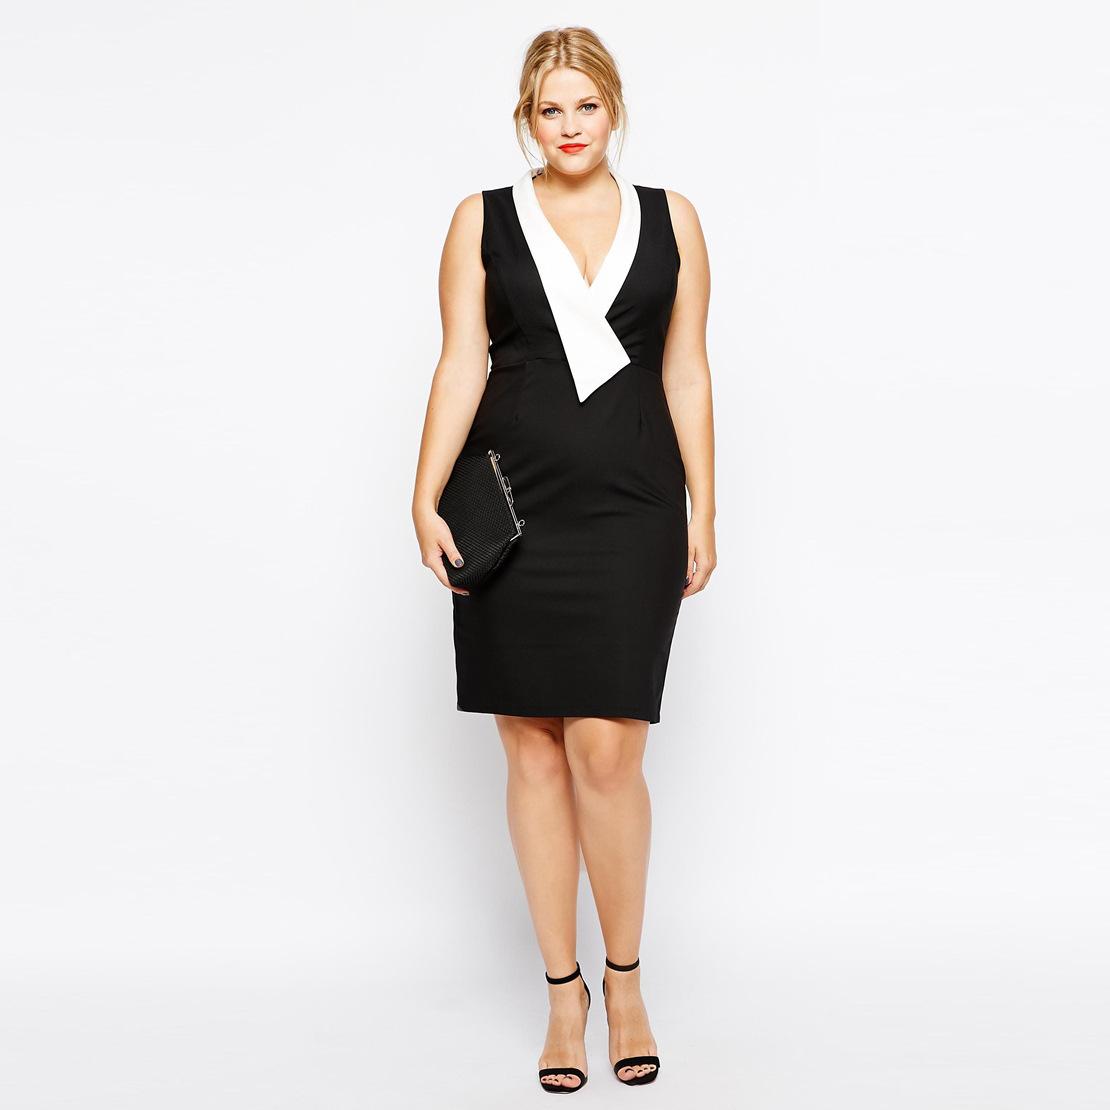 New 2016 Spring Summer Style Women Dress Beautiful Black Dresses Sleeveless Oversize Elegant Dress Vestidos Plus Size 4xl(China (Mainland))